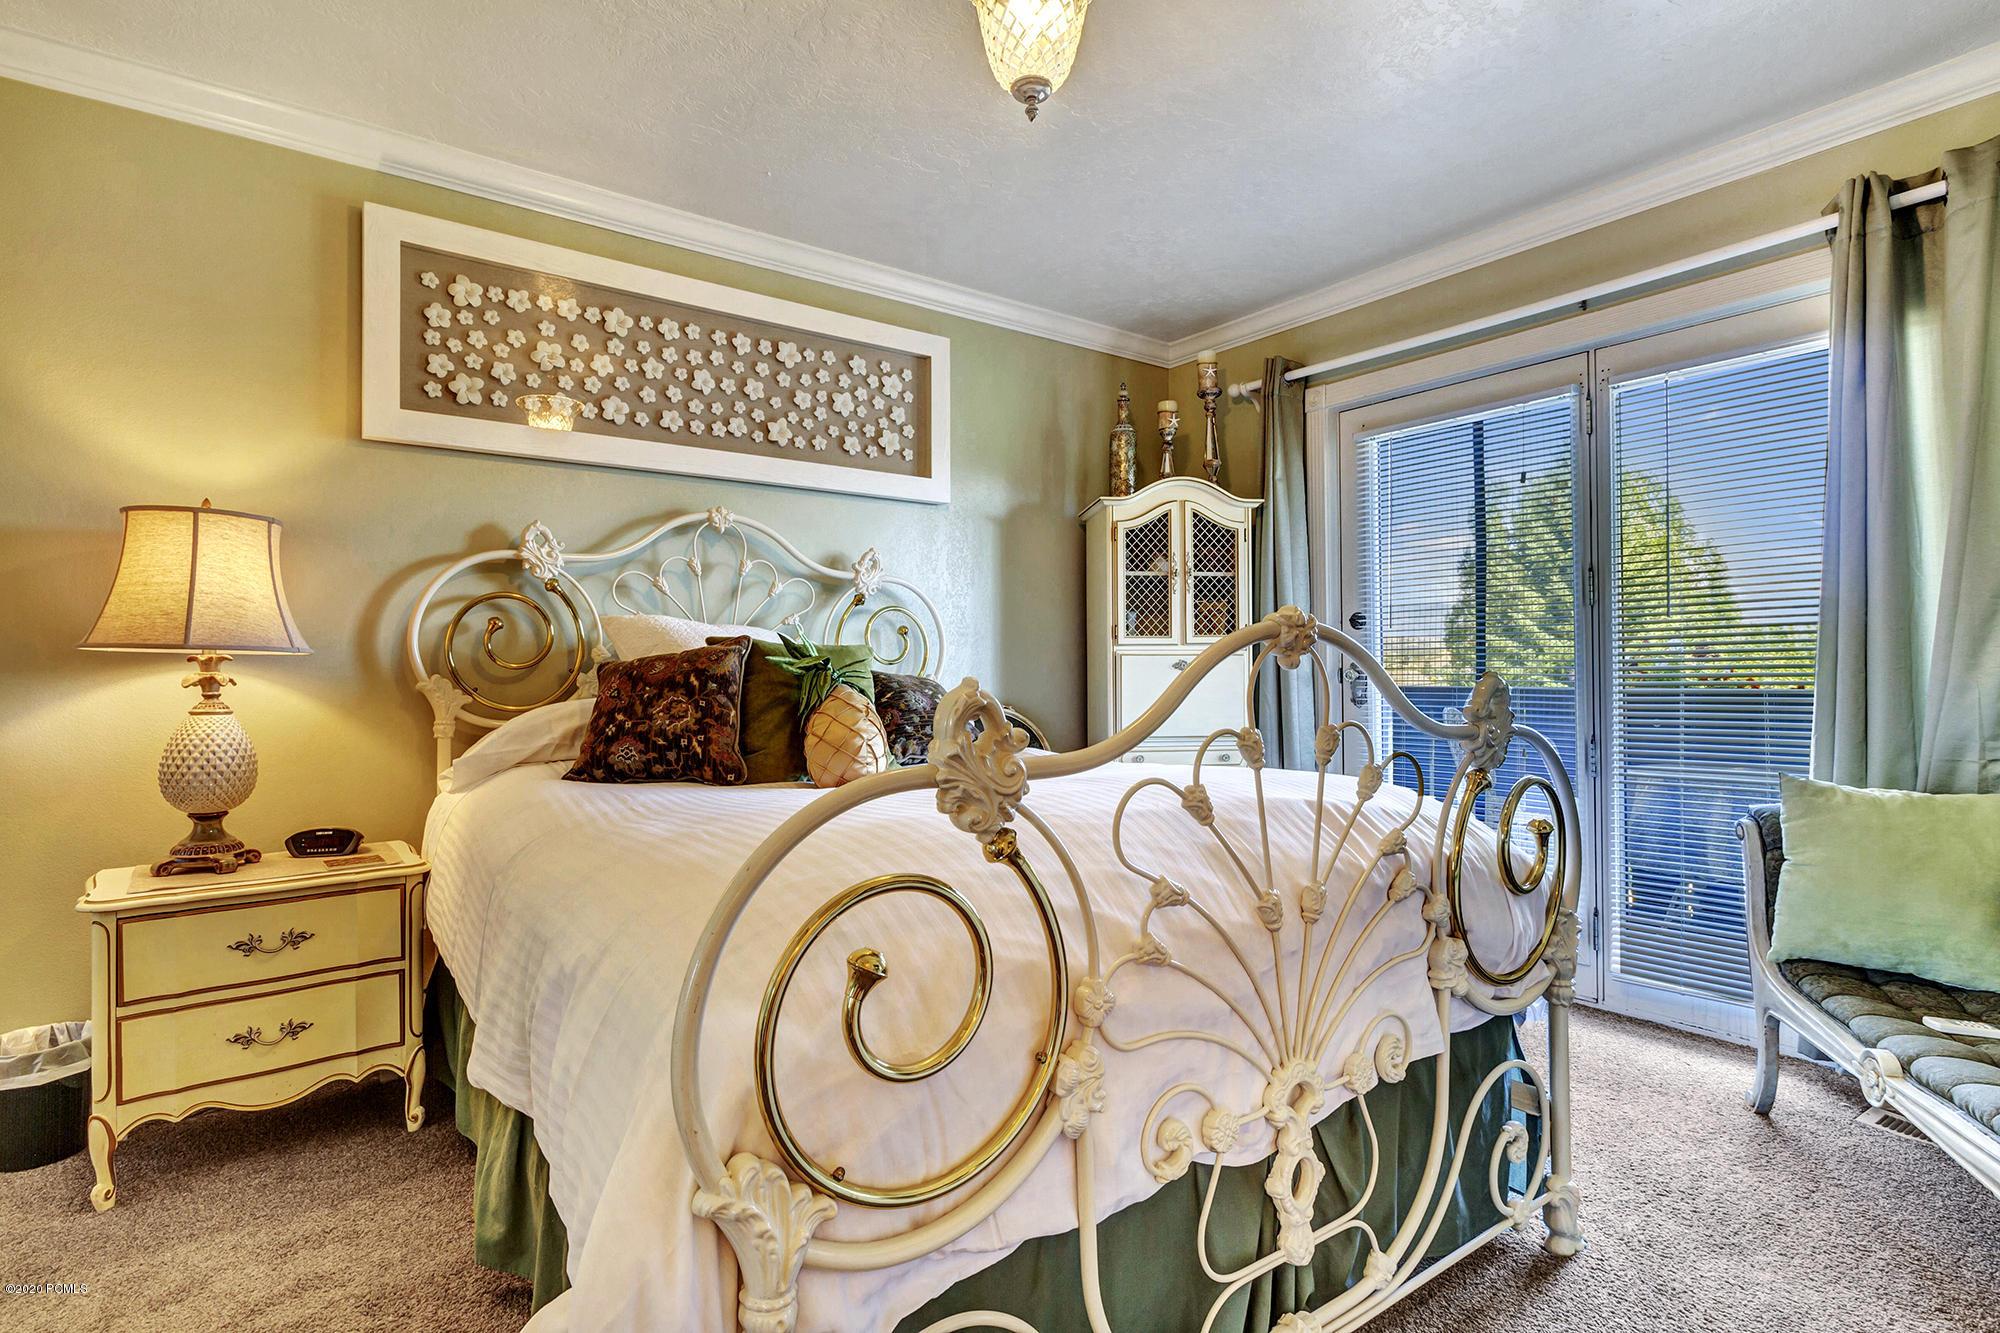 1045 Homestead Drive, Midway, Utah 84049, 6 Bedrooms Bedrooms, ,7 BathroomsBathrooms,Single Family,For Sale,Homestead,12003305